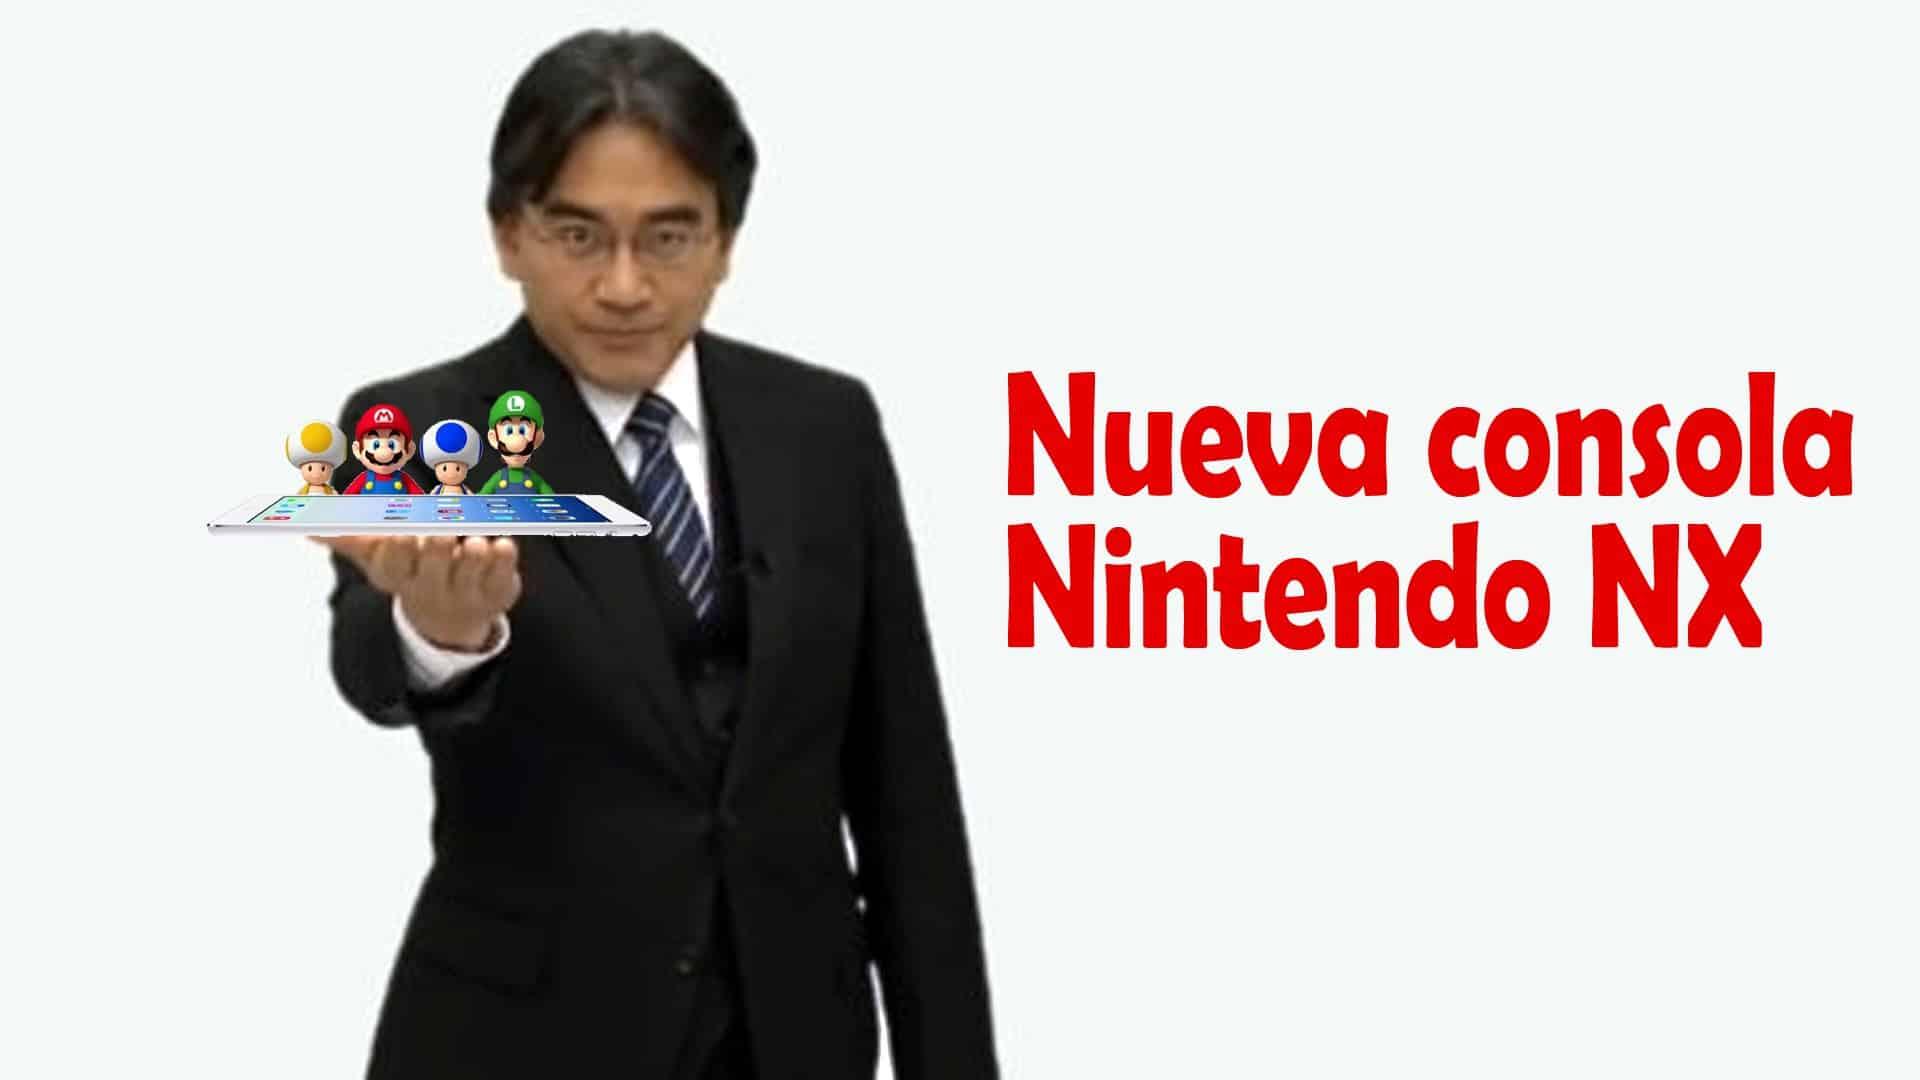 maxresdefault مستقبل نينتندو: جهاز Nintendo NX و ألعاب الهواتف الذكية